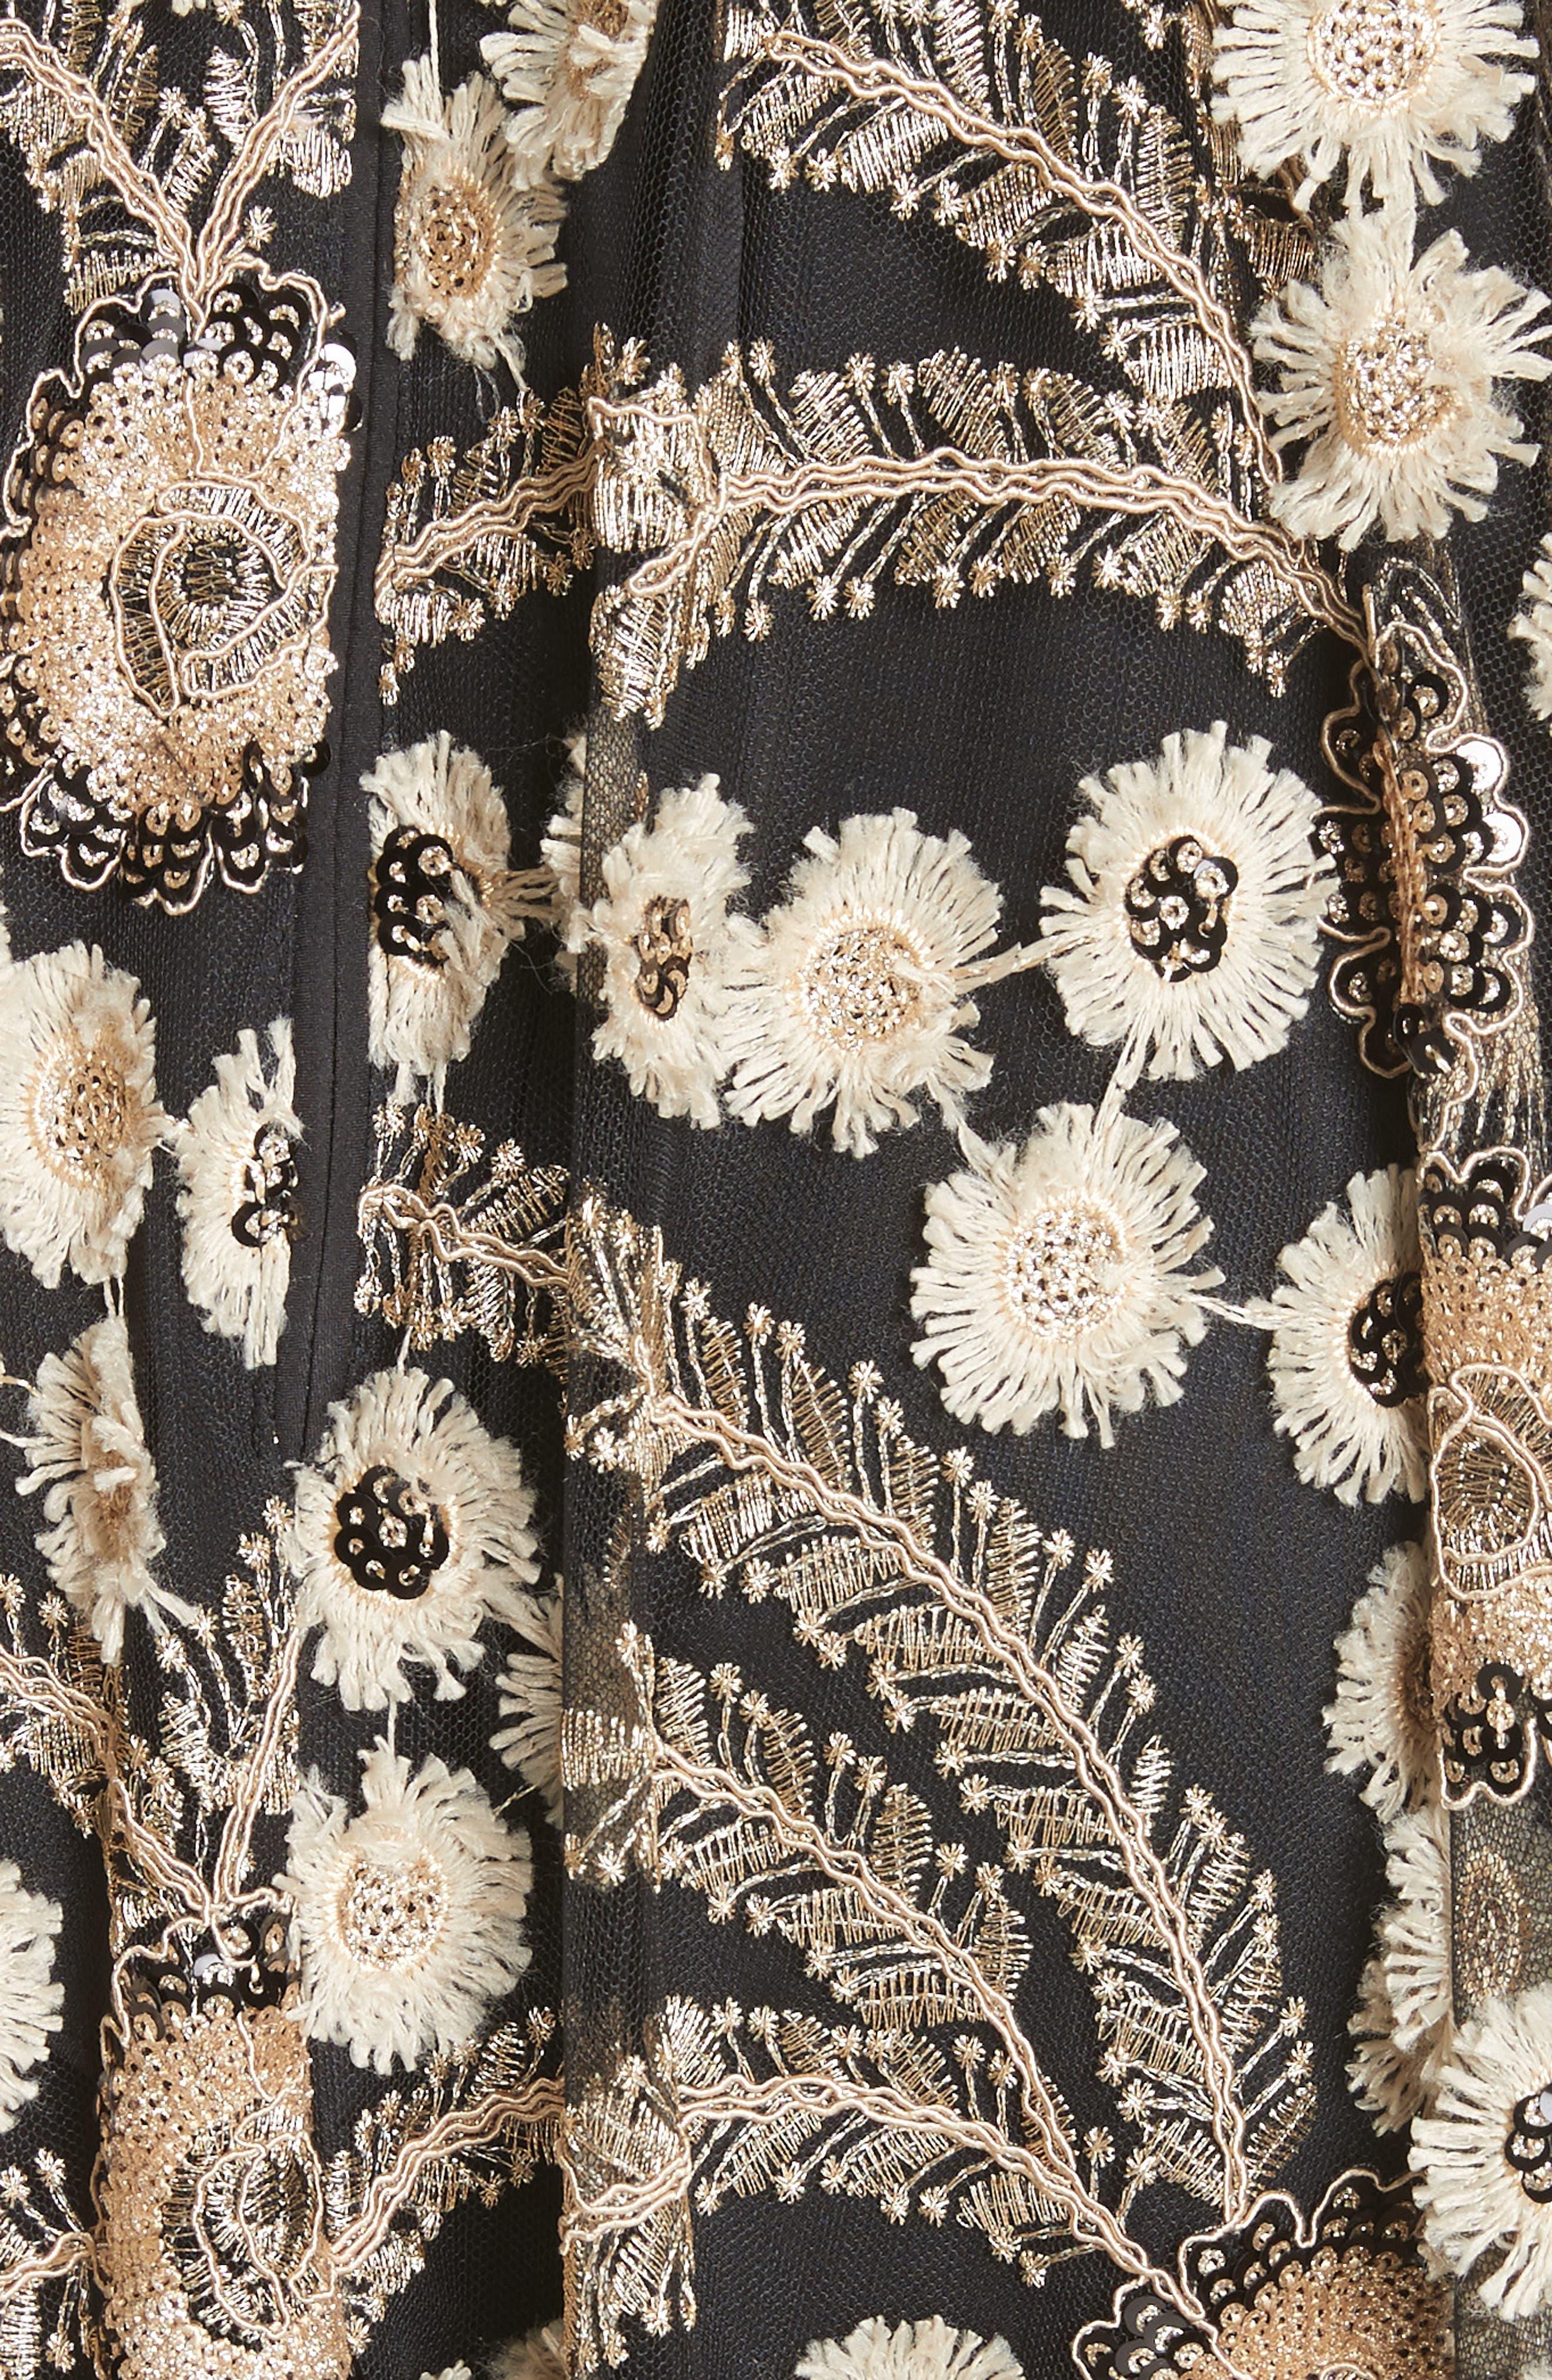 Embellished A-Line Maxi Dress,                             Alternate thumbnail 5, color,                             001